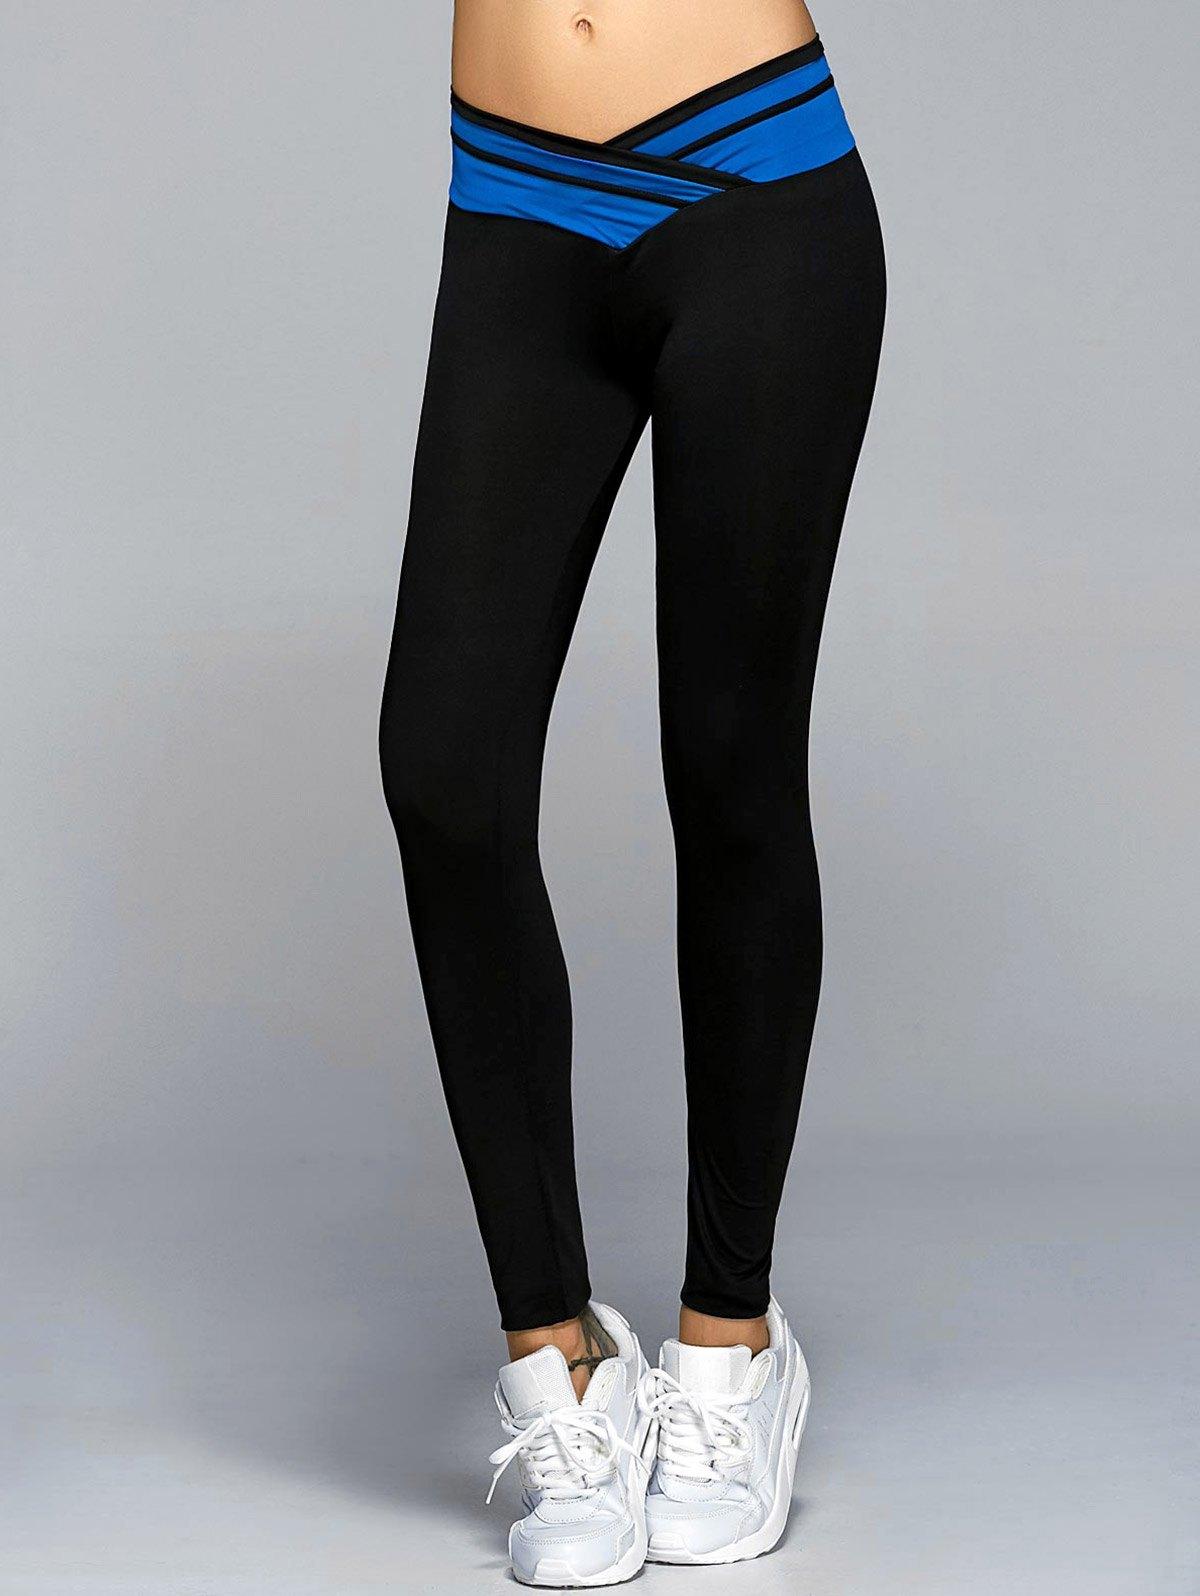 High Waisted Pannel Yoga Leggings